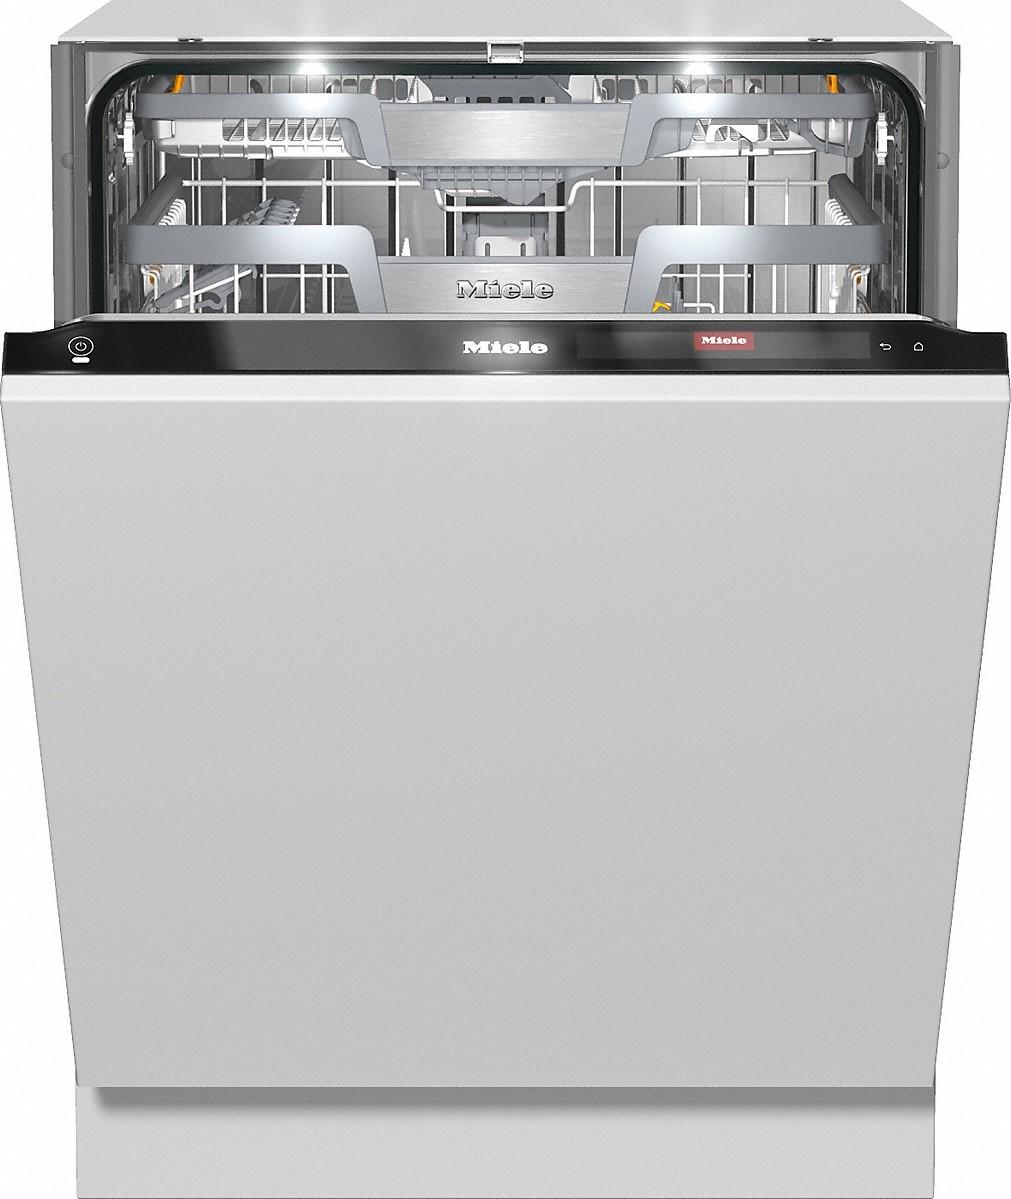 Miele G 7960 SCVI Vollintegrierter Geschirrspüler CleanSteel/Obsidianschwarz